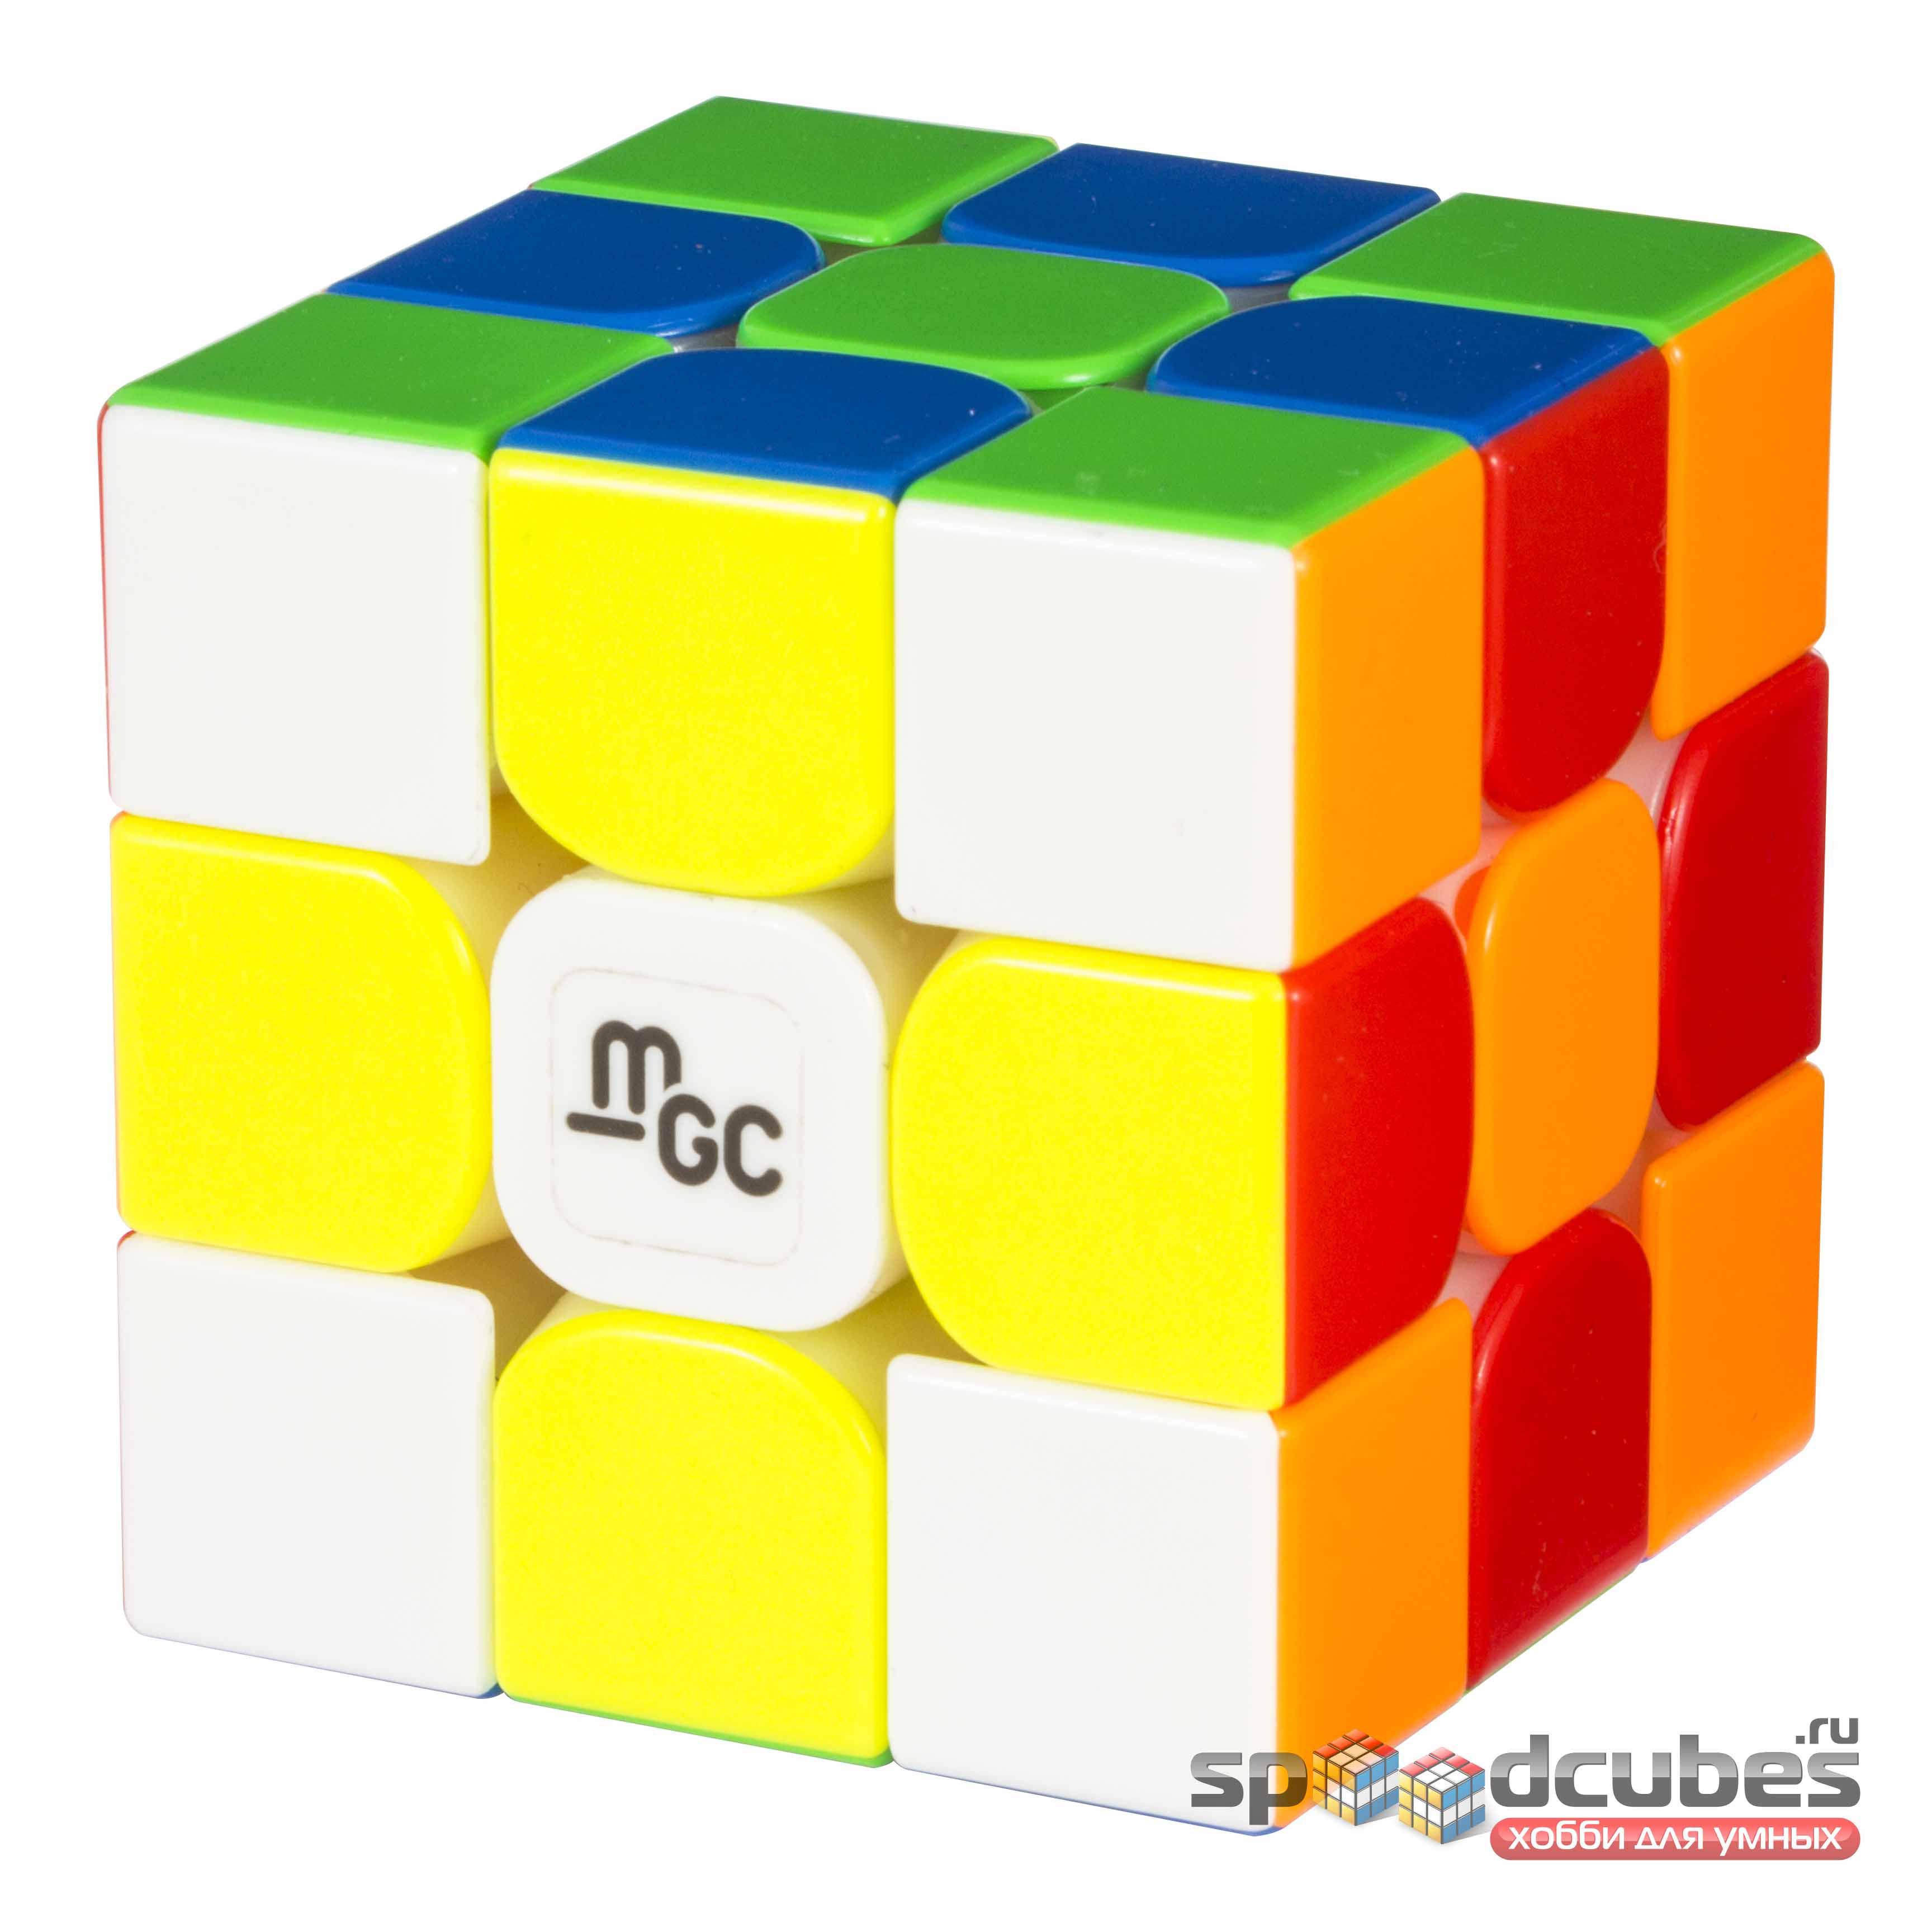 YJ MGC 3x3x3 V2 Color 3